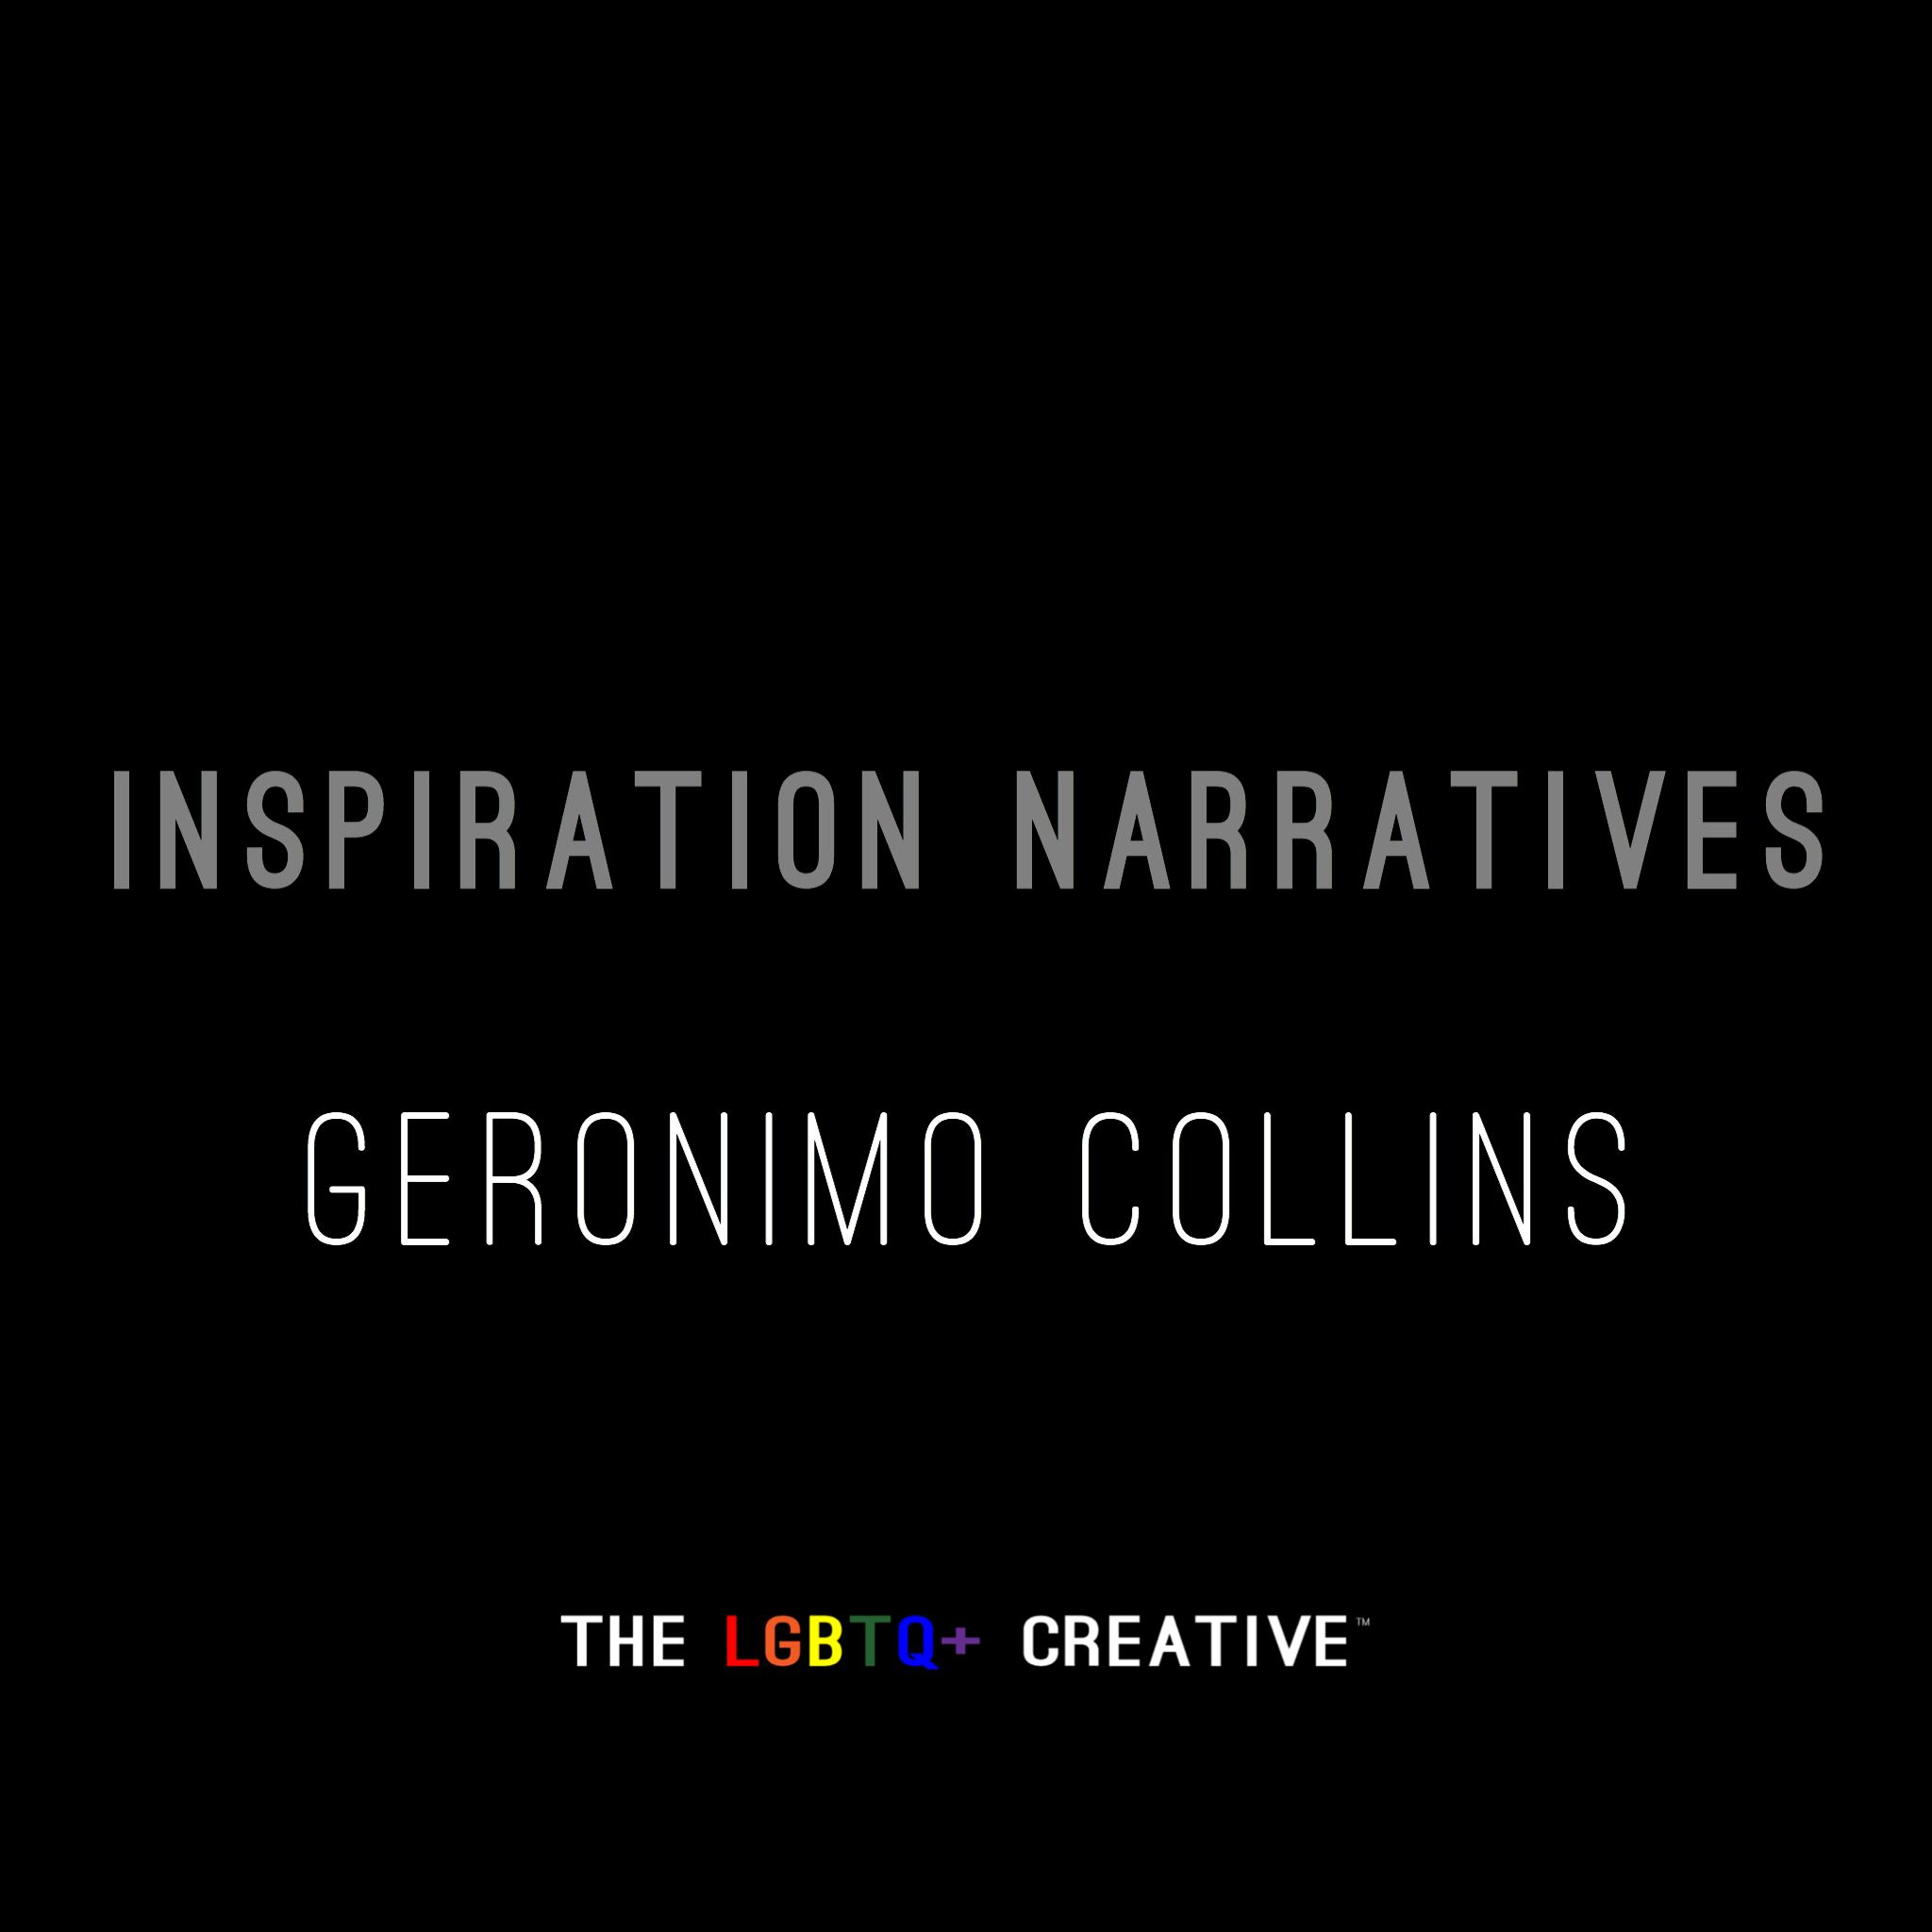 Inspiration Narrative - Geronimo Collins